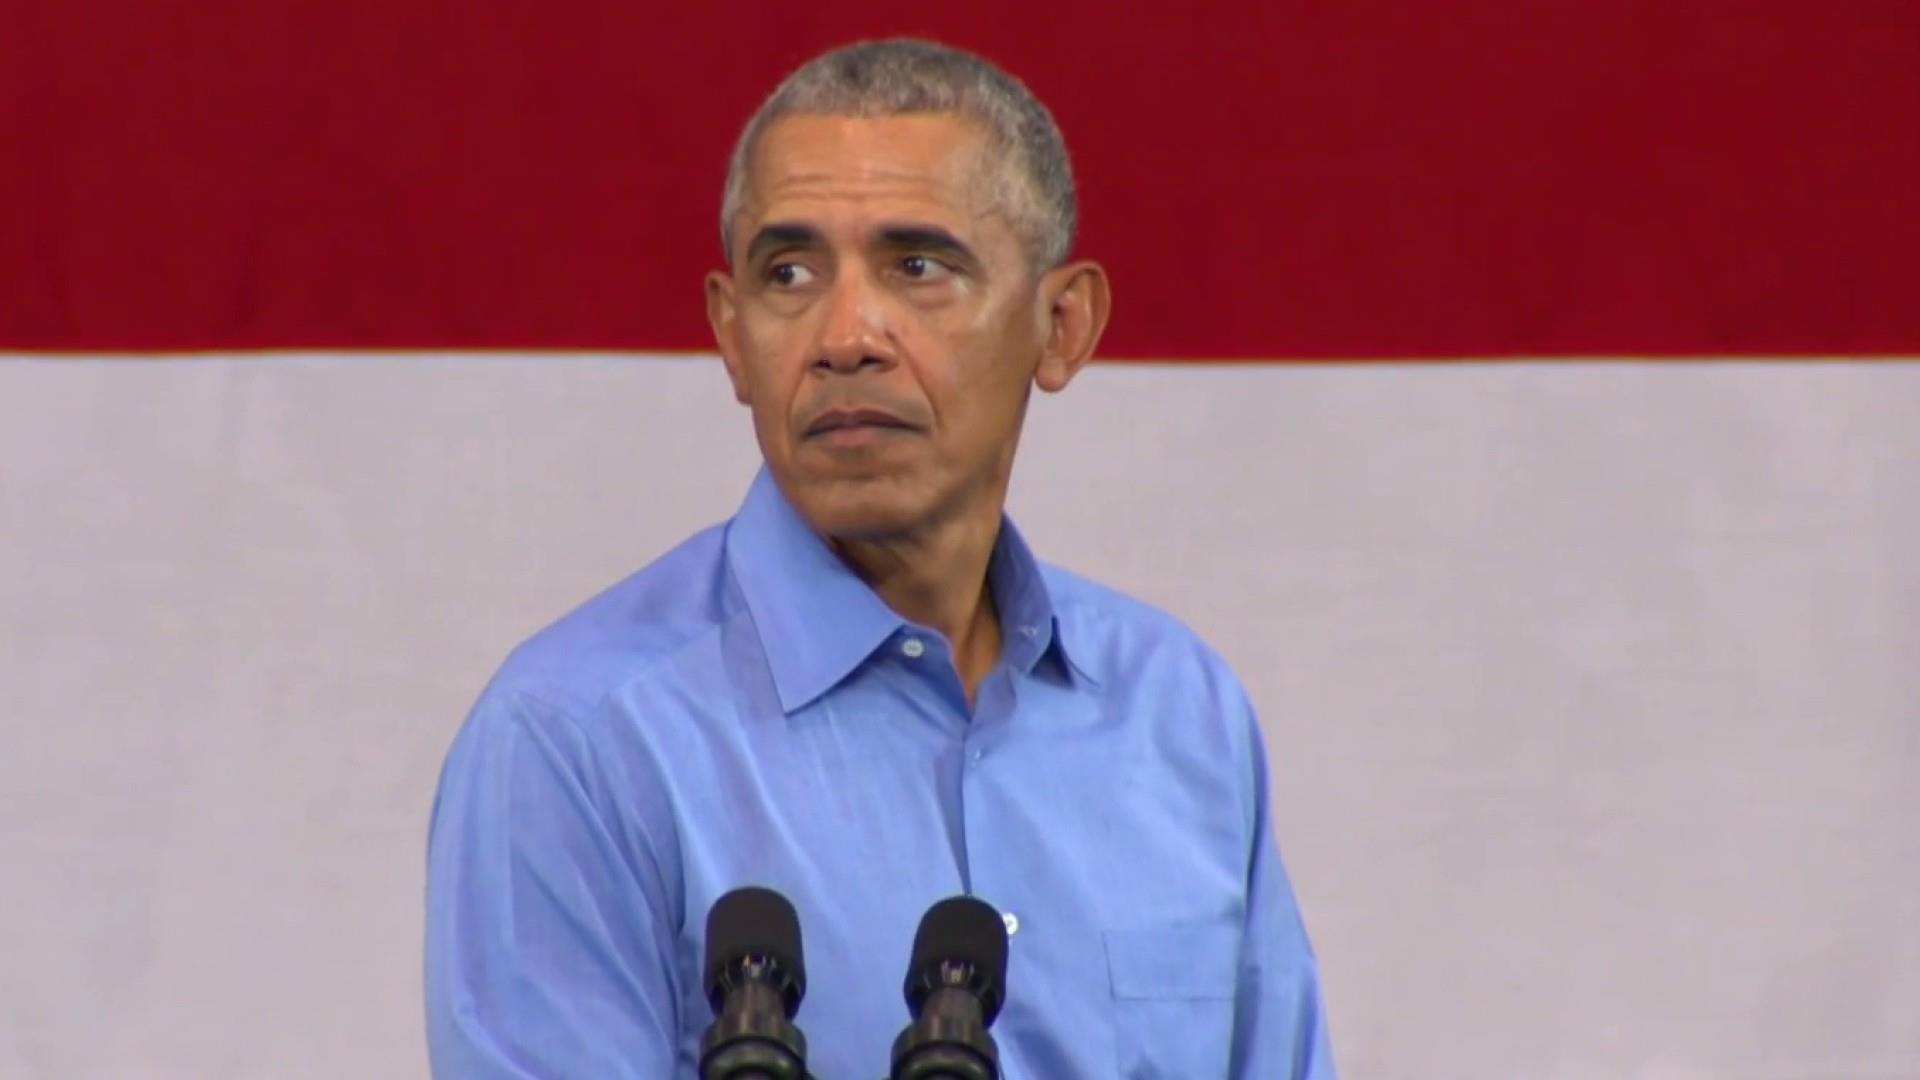 Obama slams politicians lying